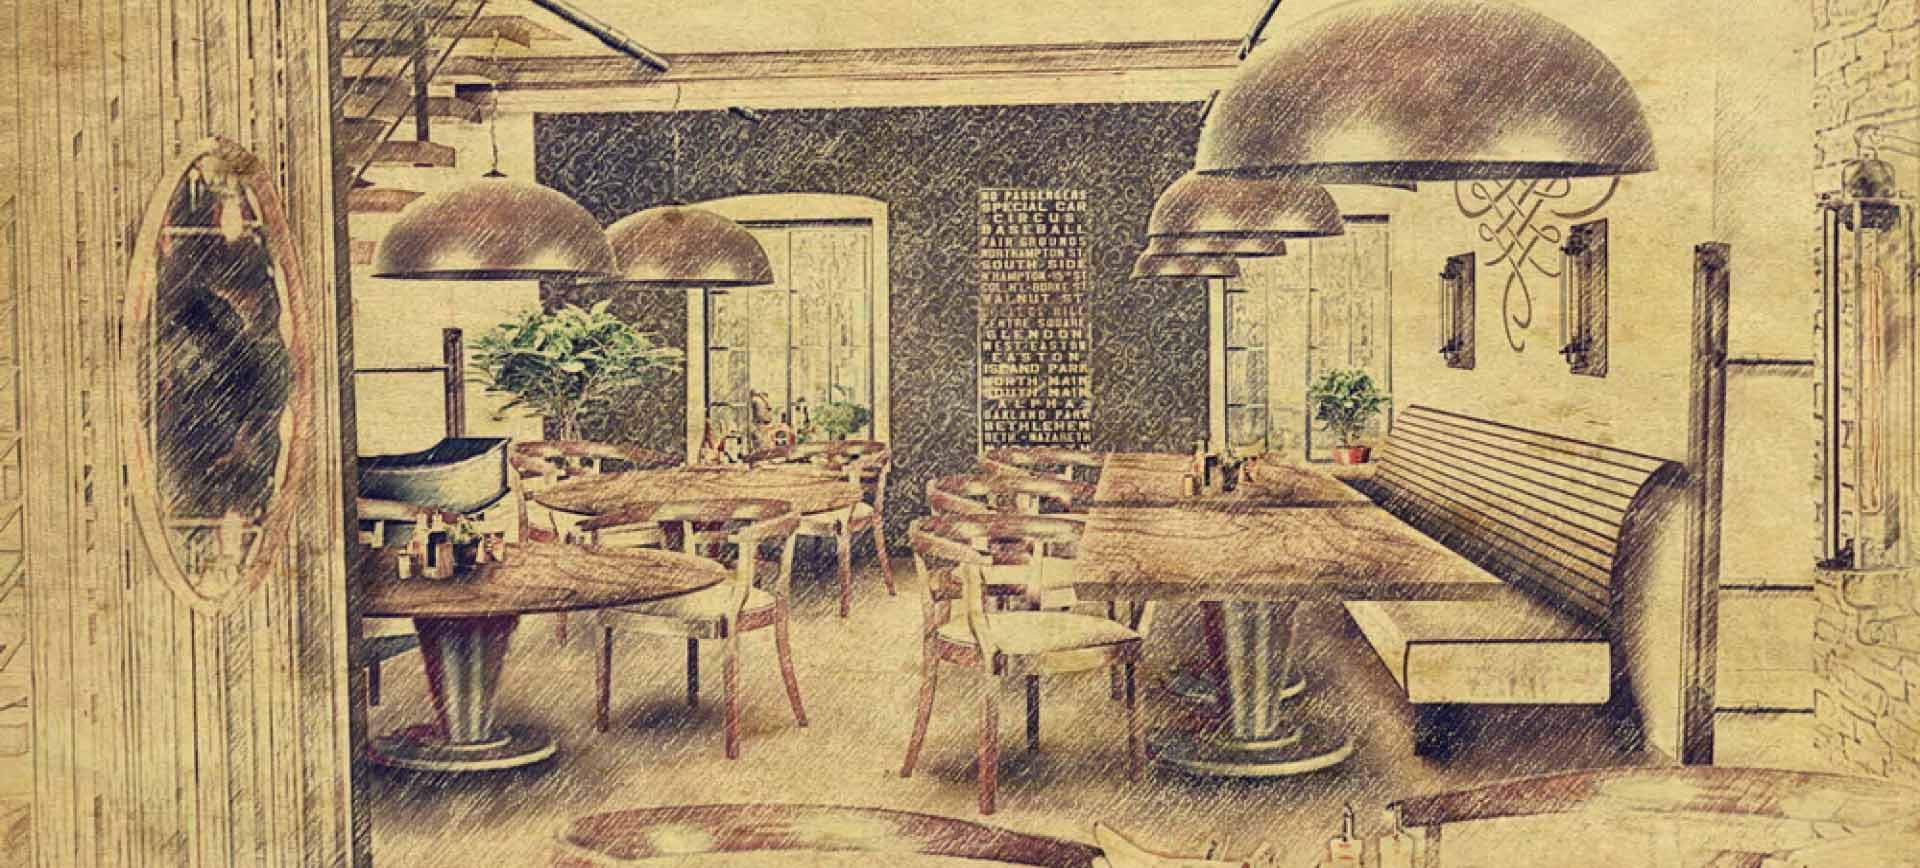 Stodola Herink nákres interiéru restaurace